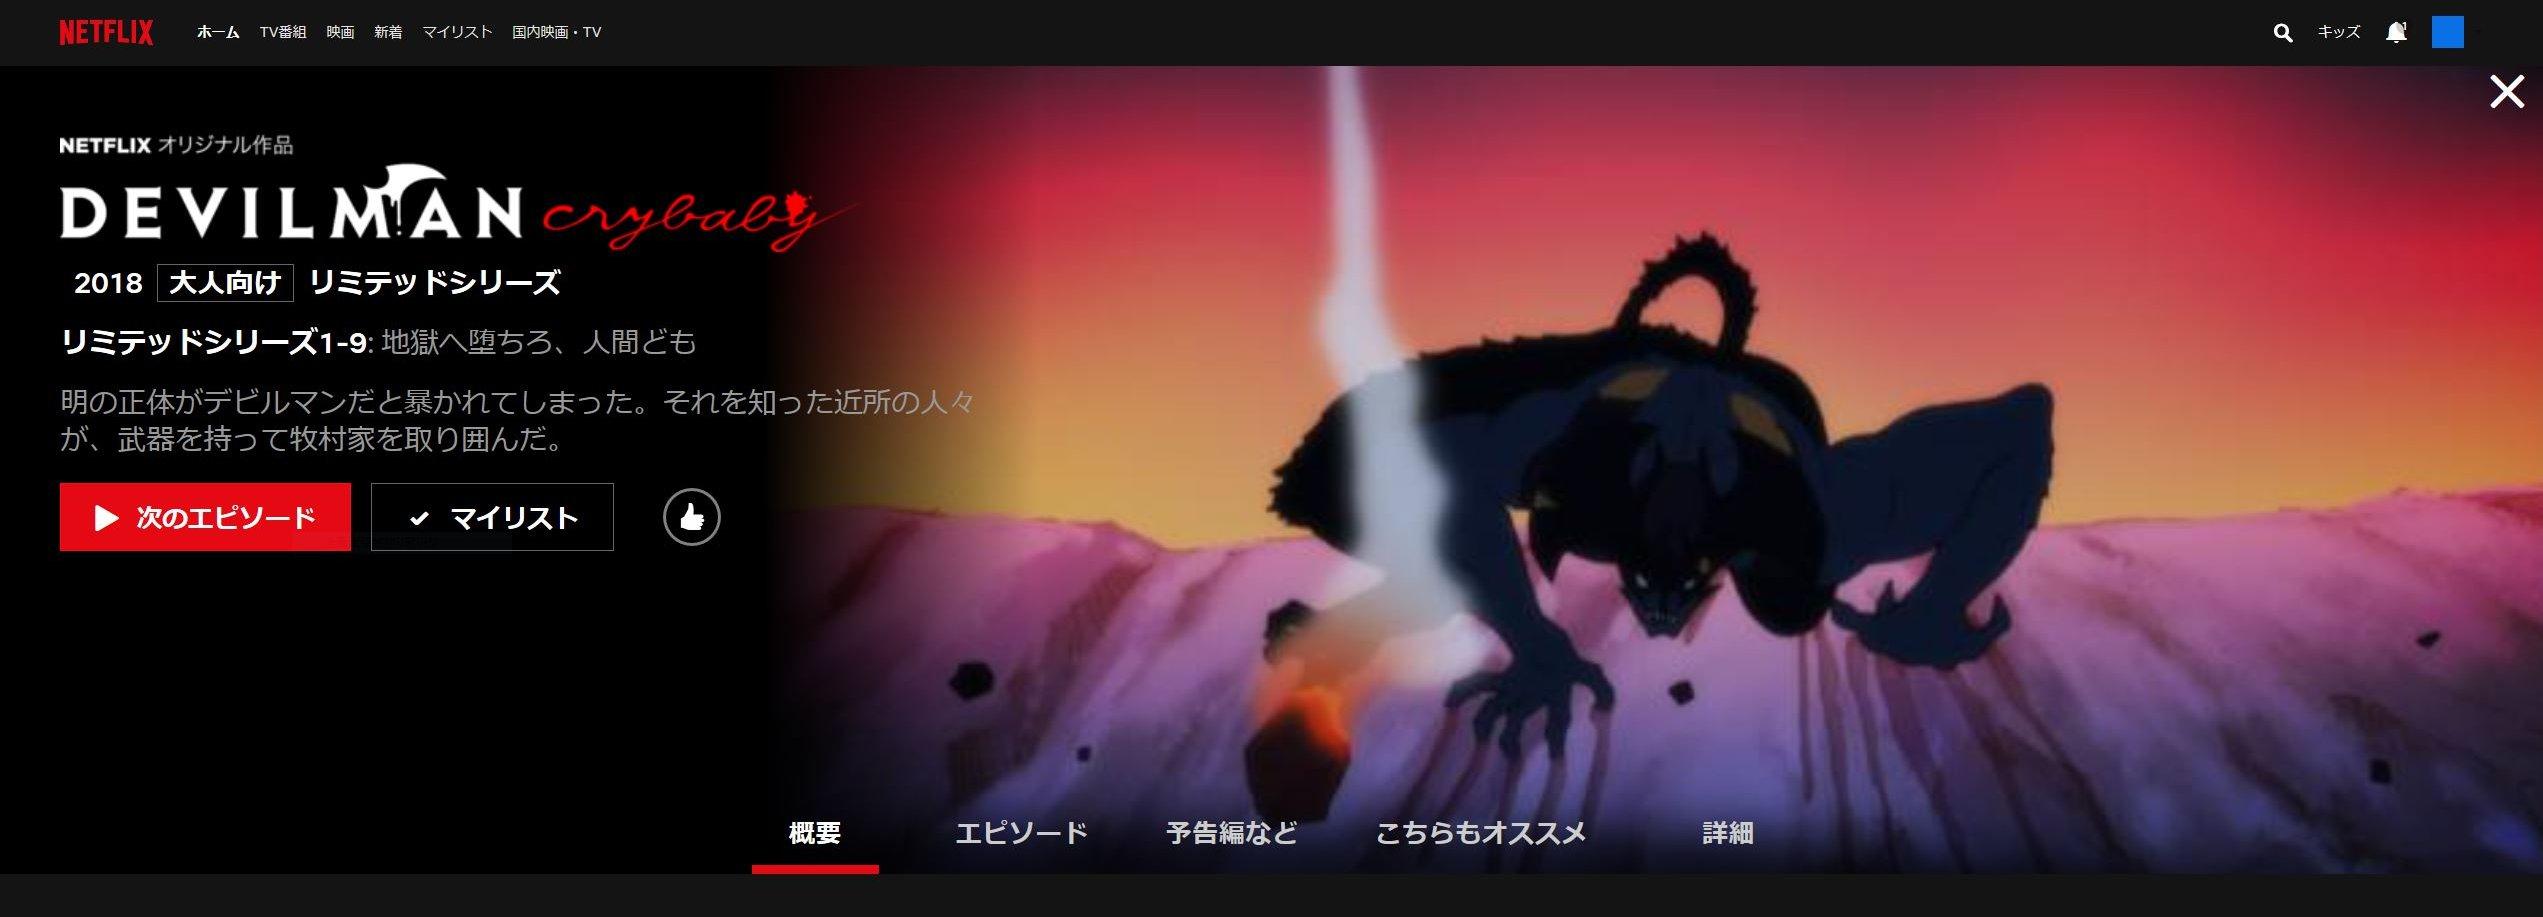 『DevilmanCrybaby』第9話サブタイトル